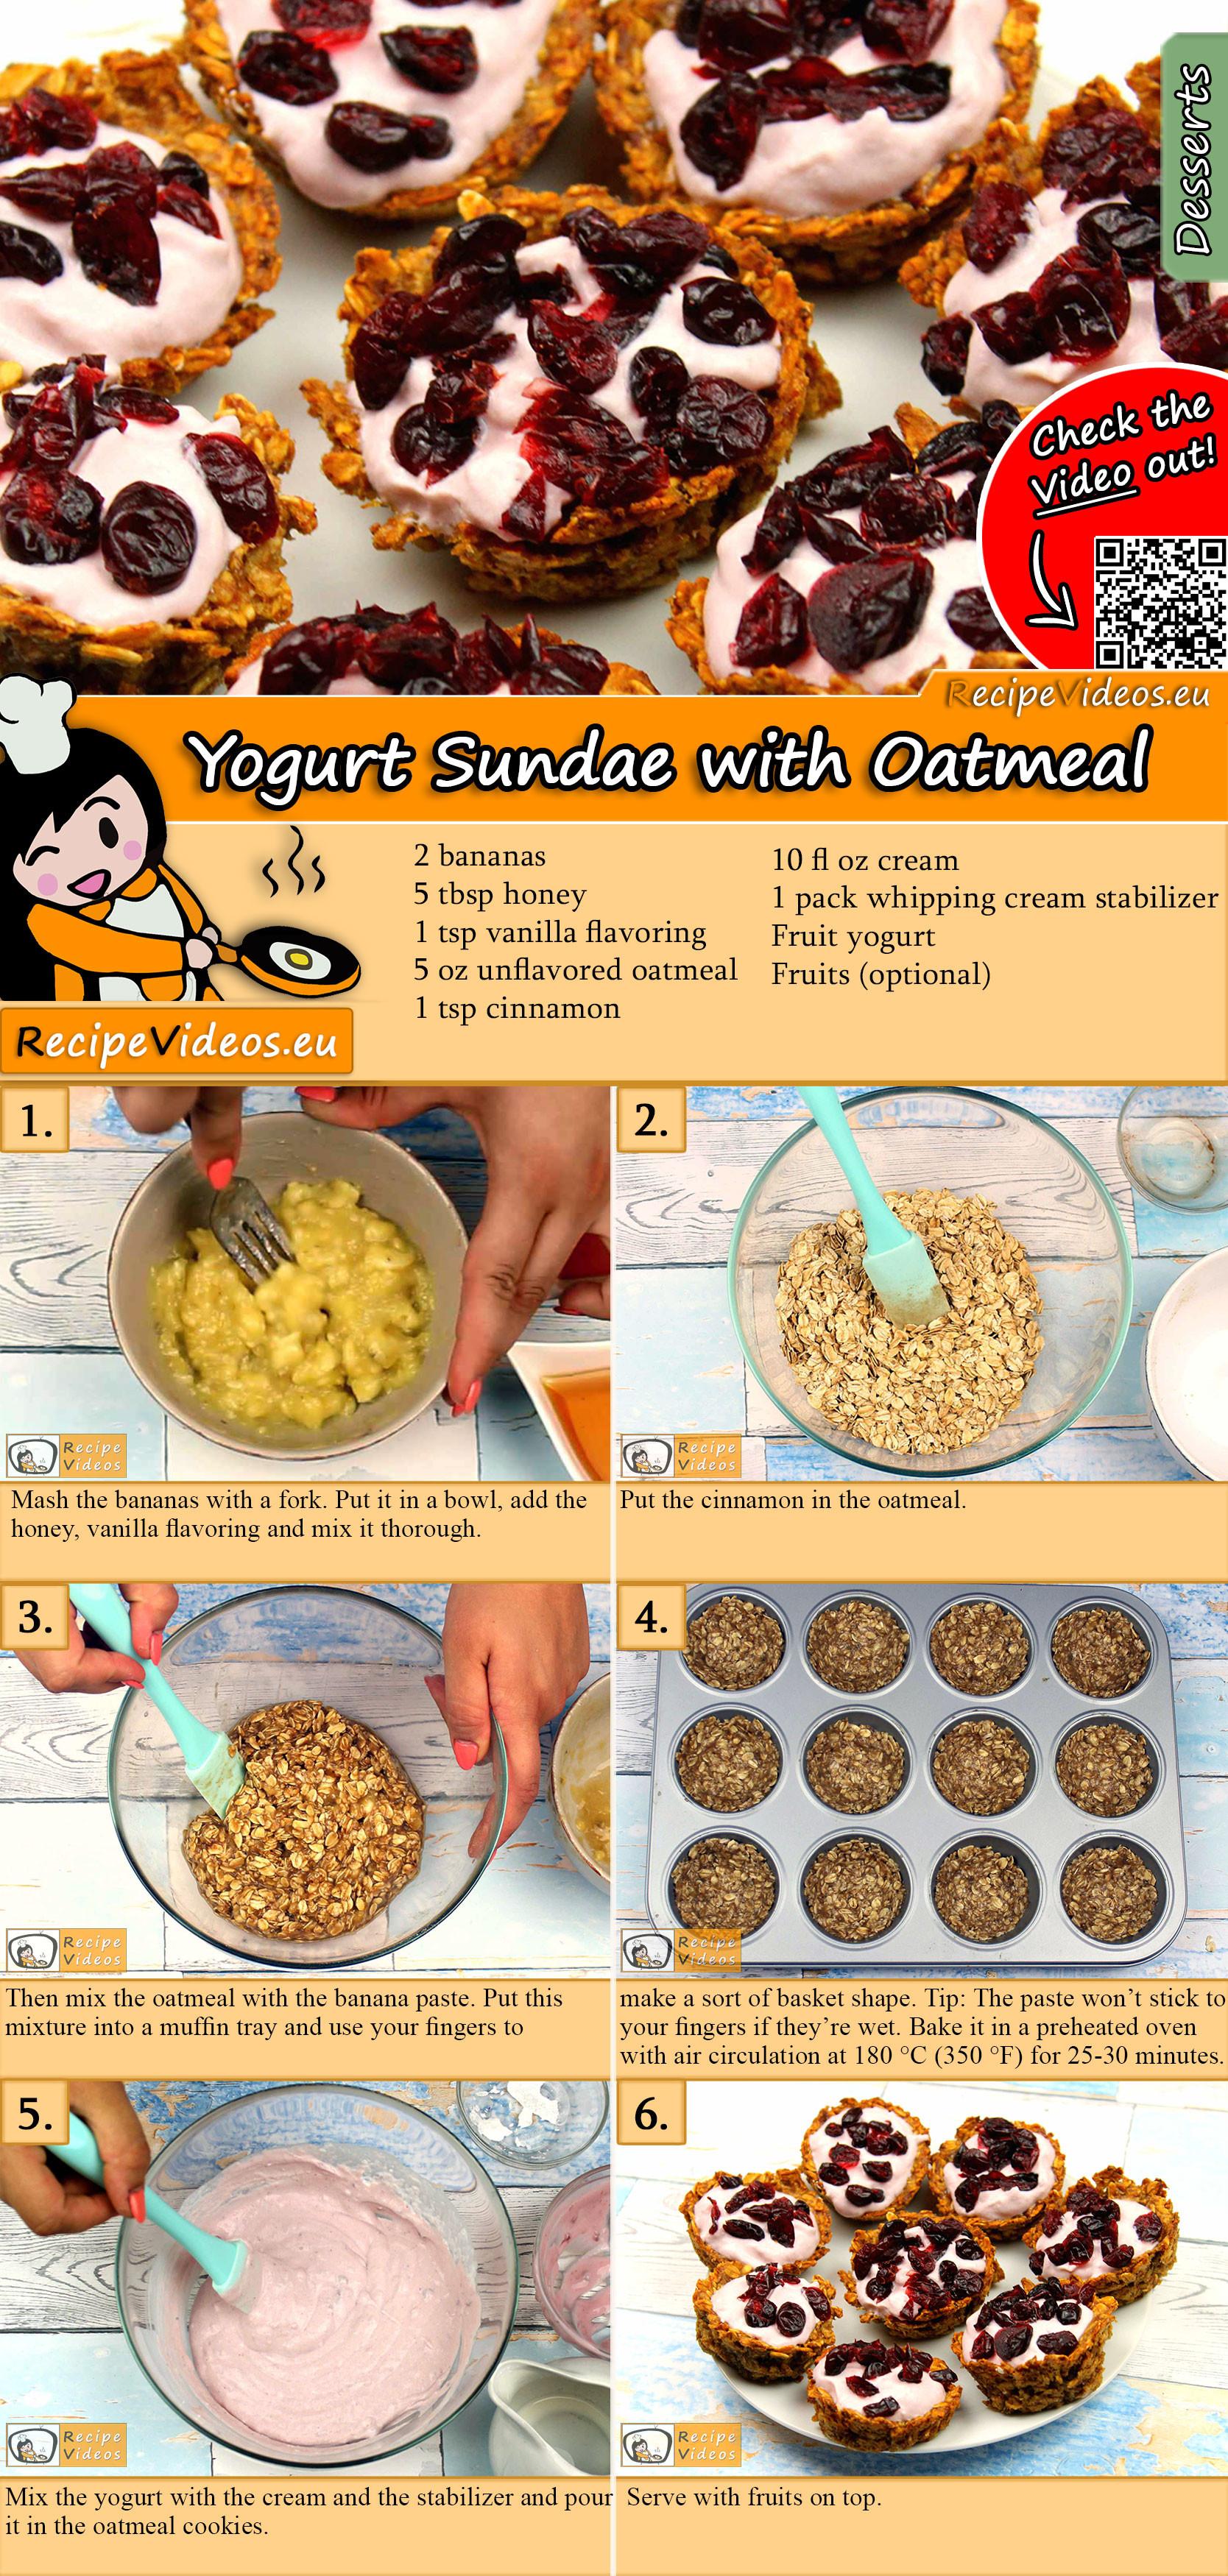 Yogurt Sundae with Oatmeal recipe with video